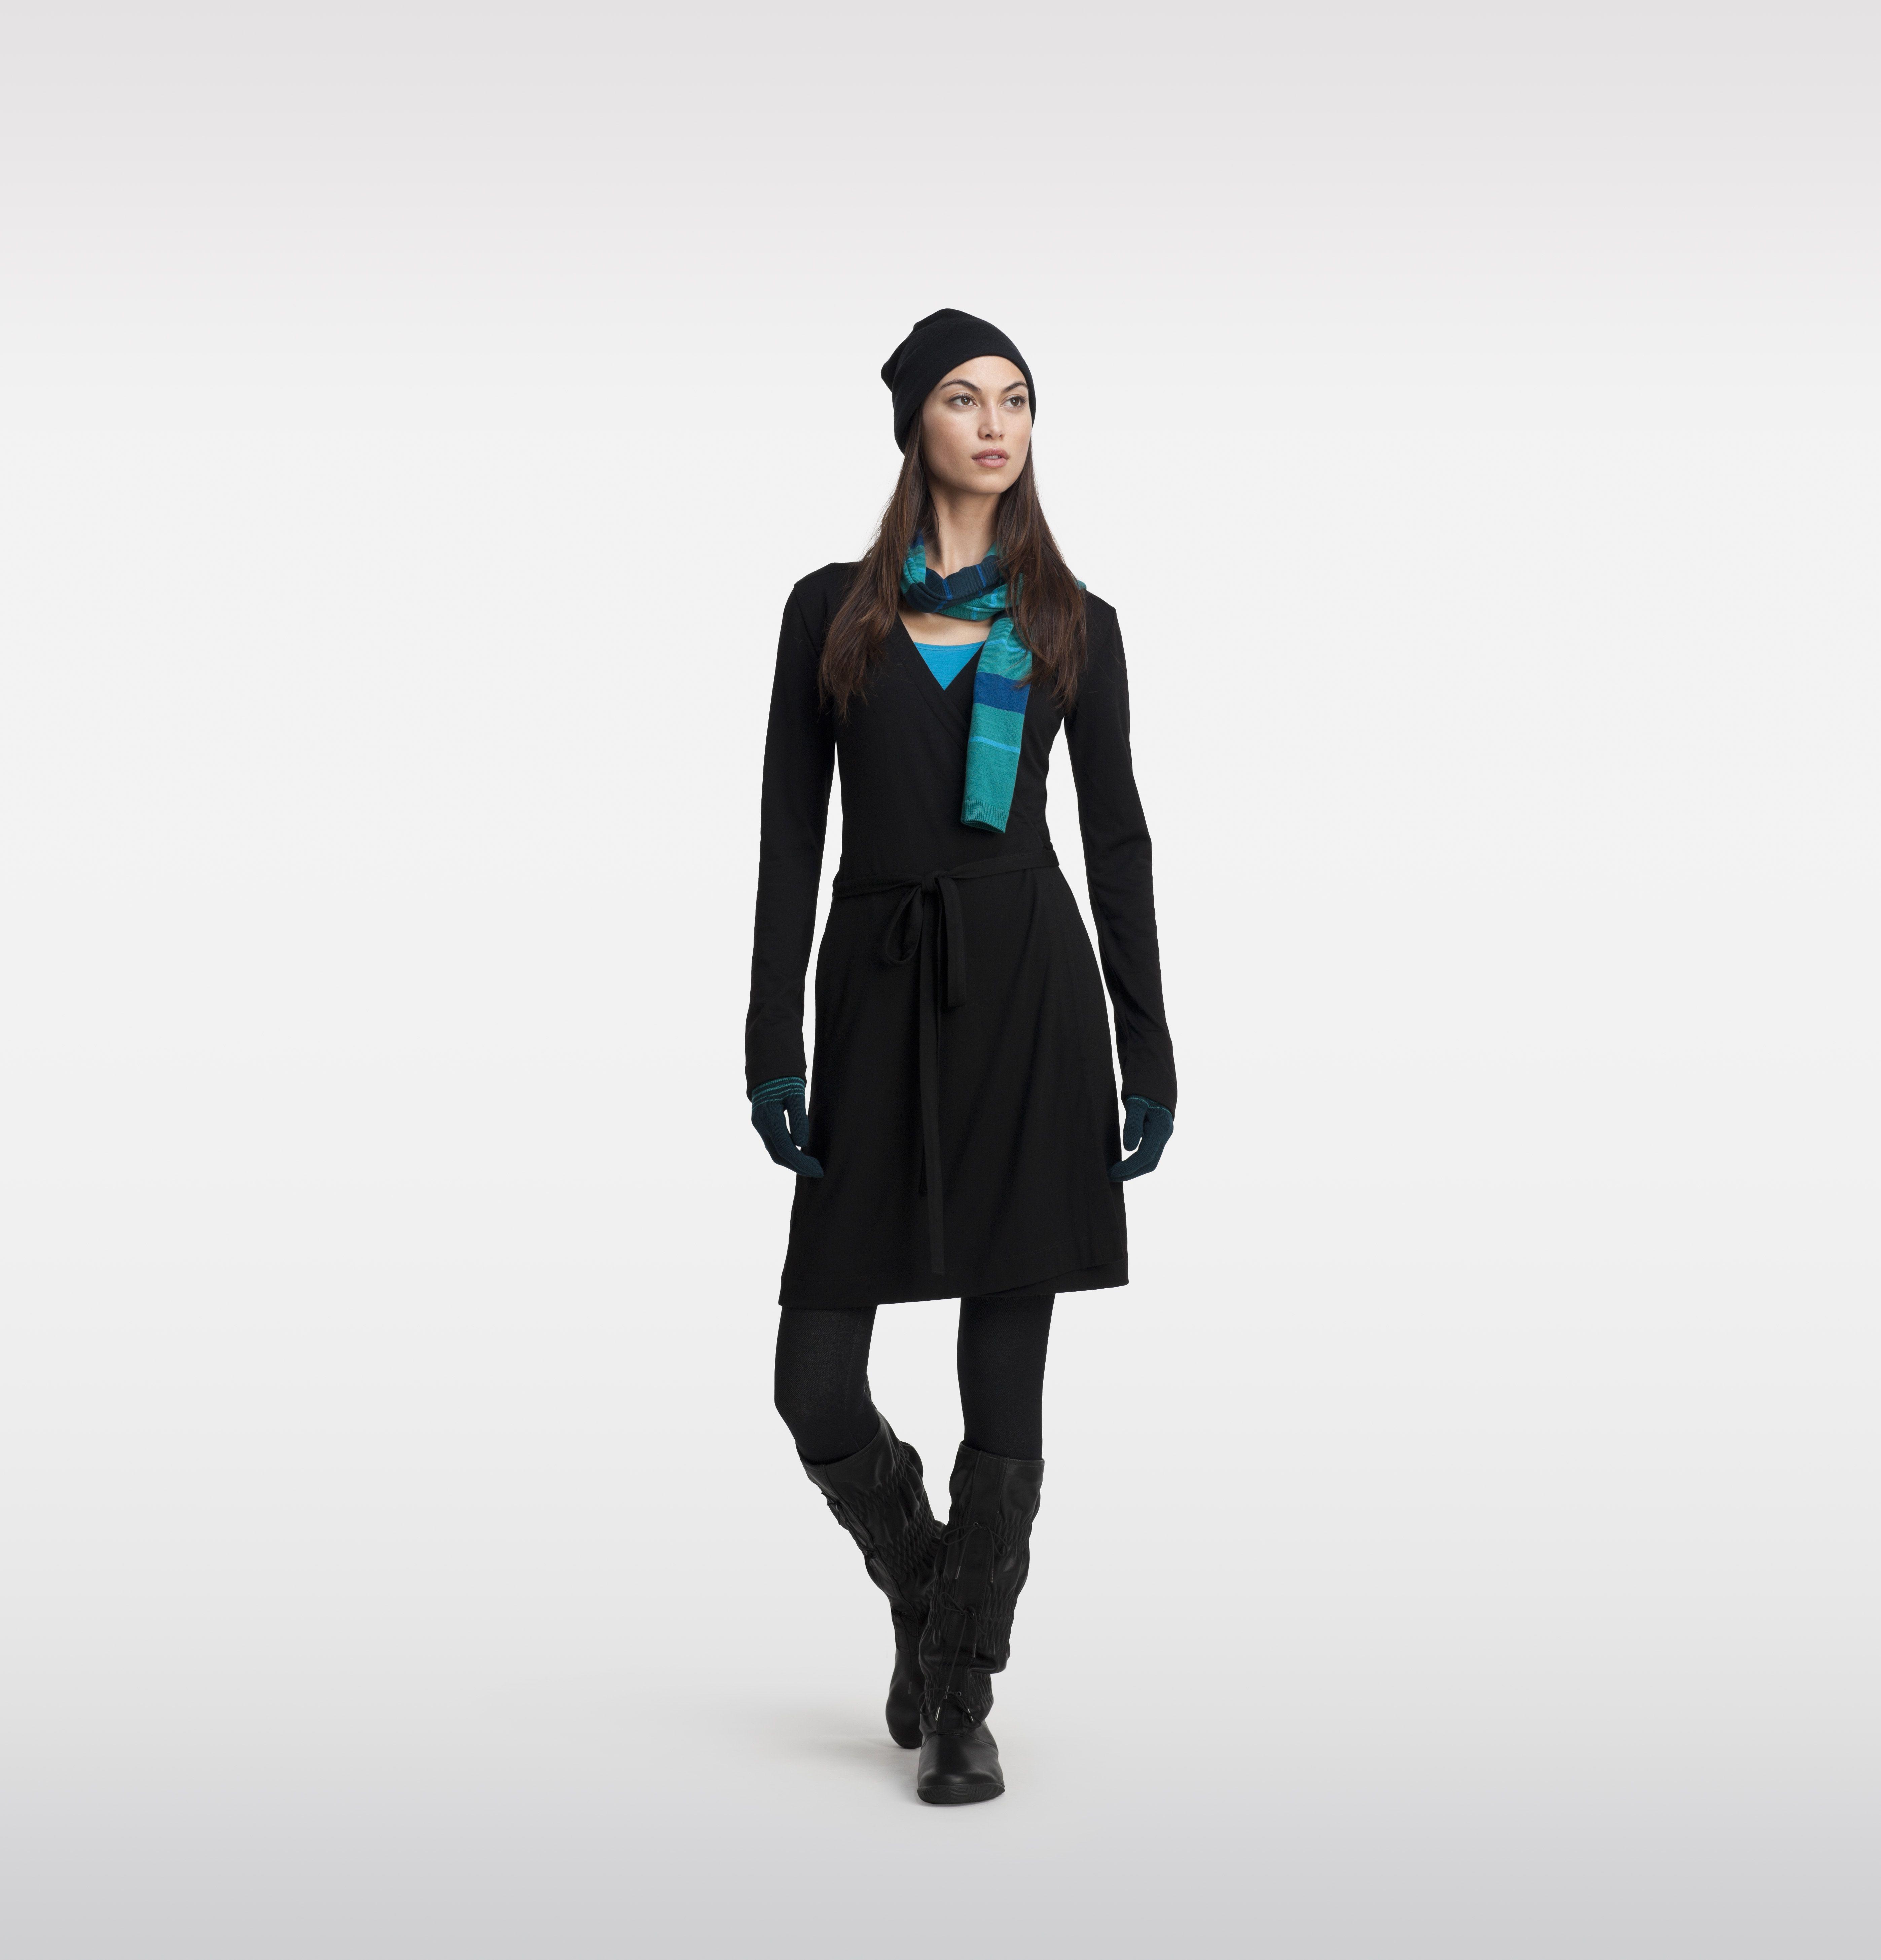 fb4f5ae5979 Icebreaker Roma dress